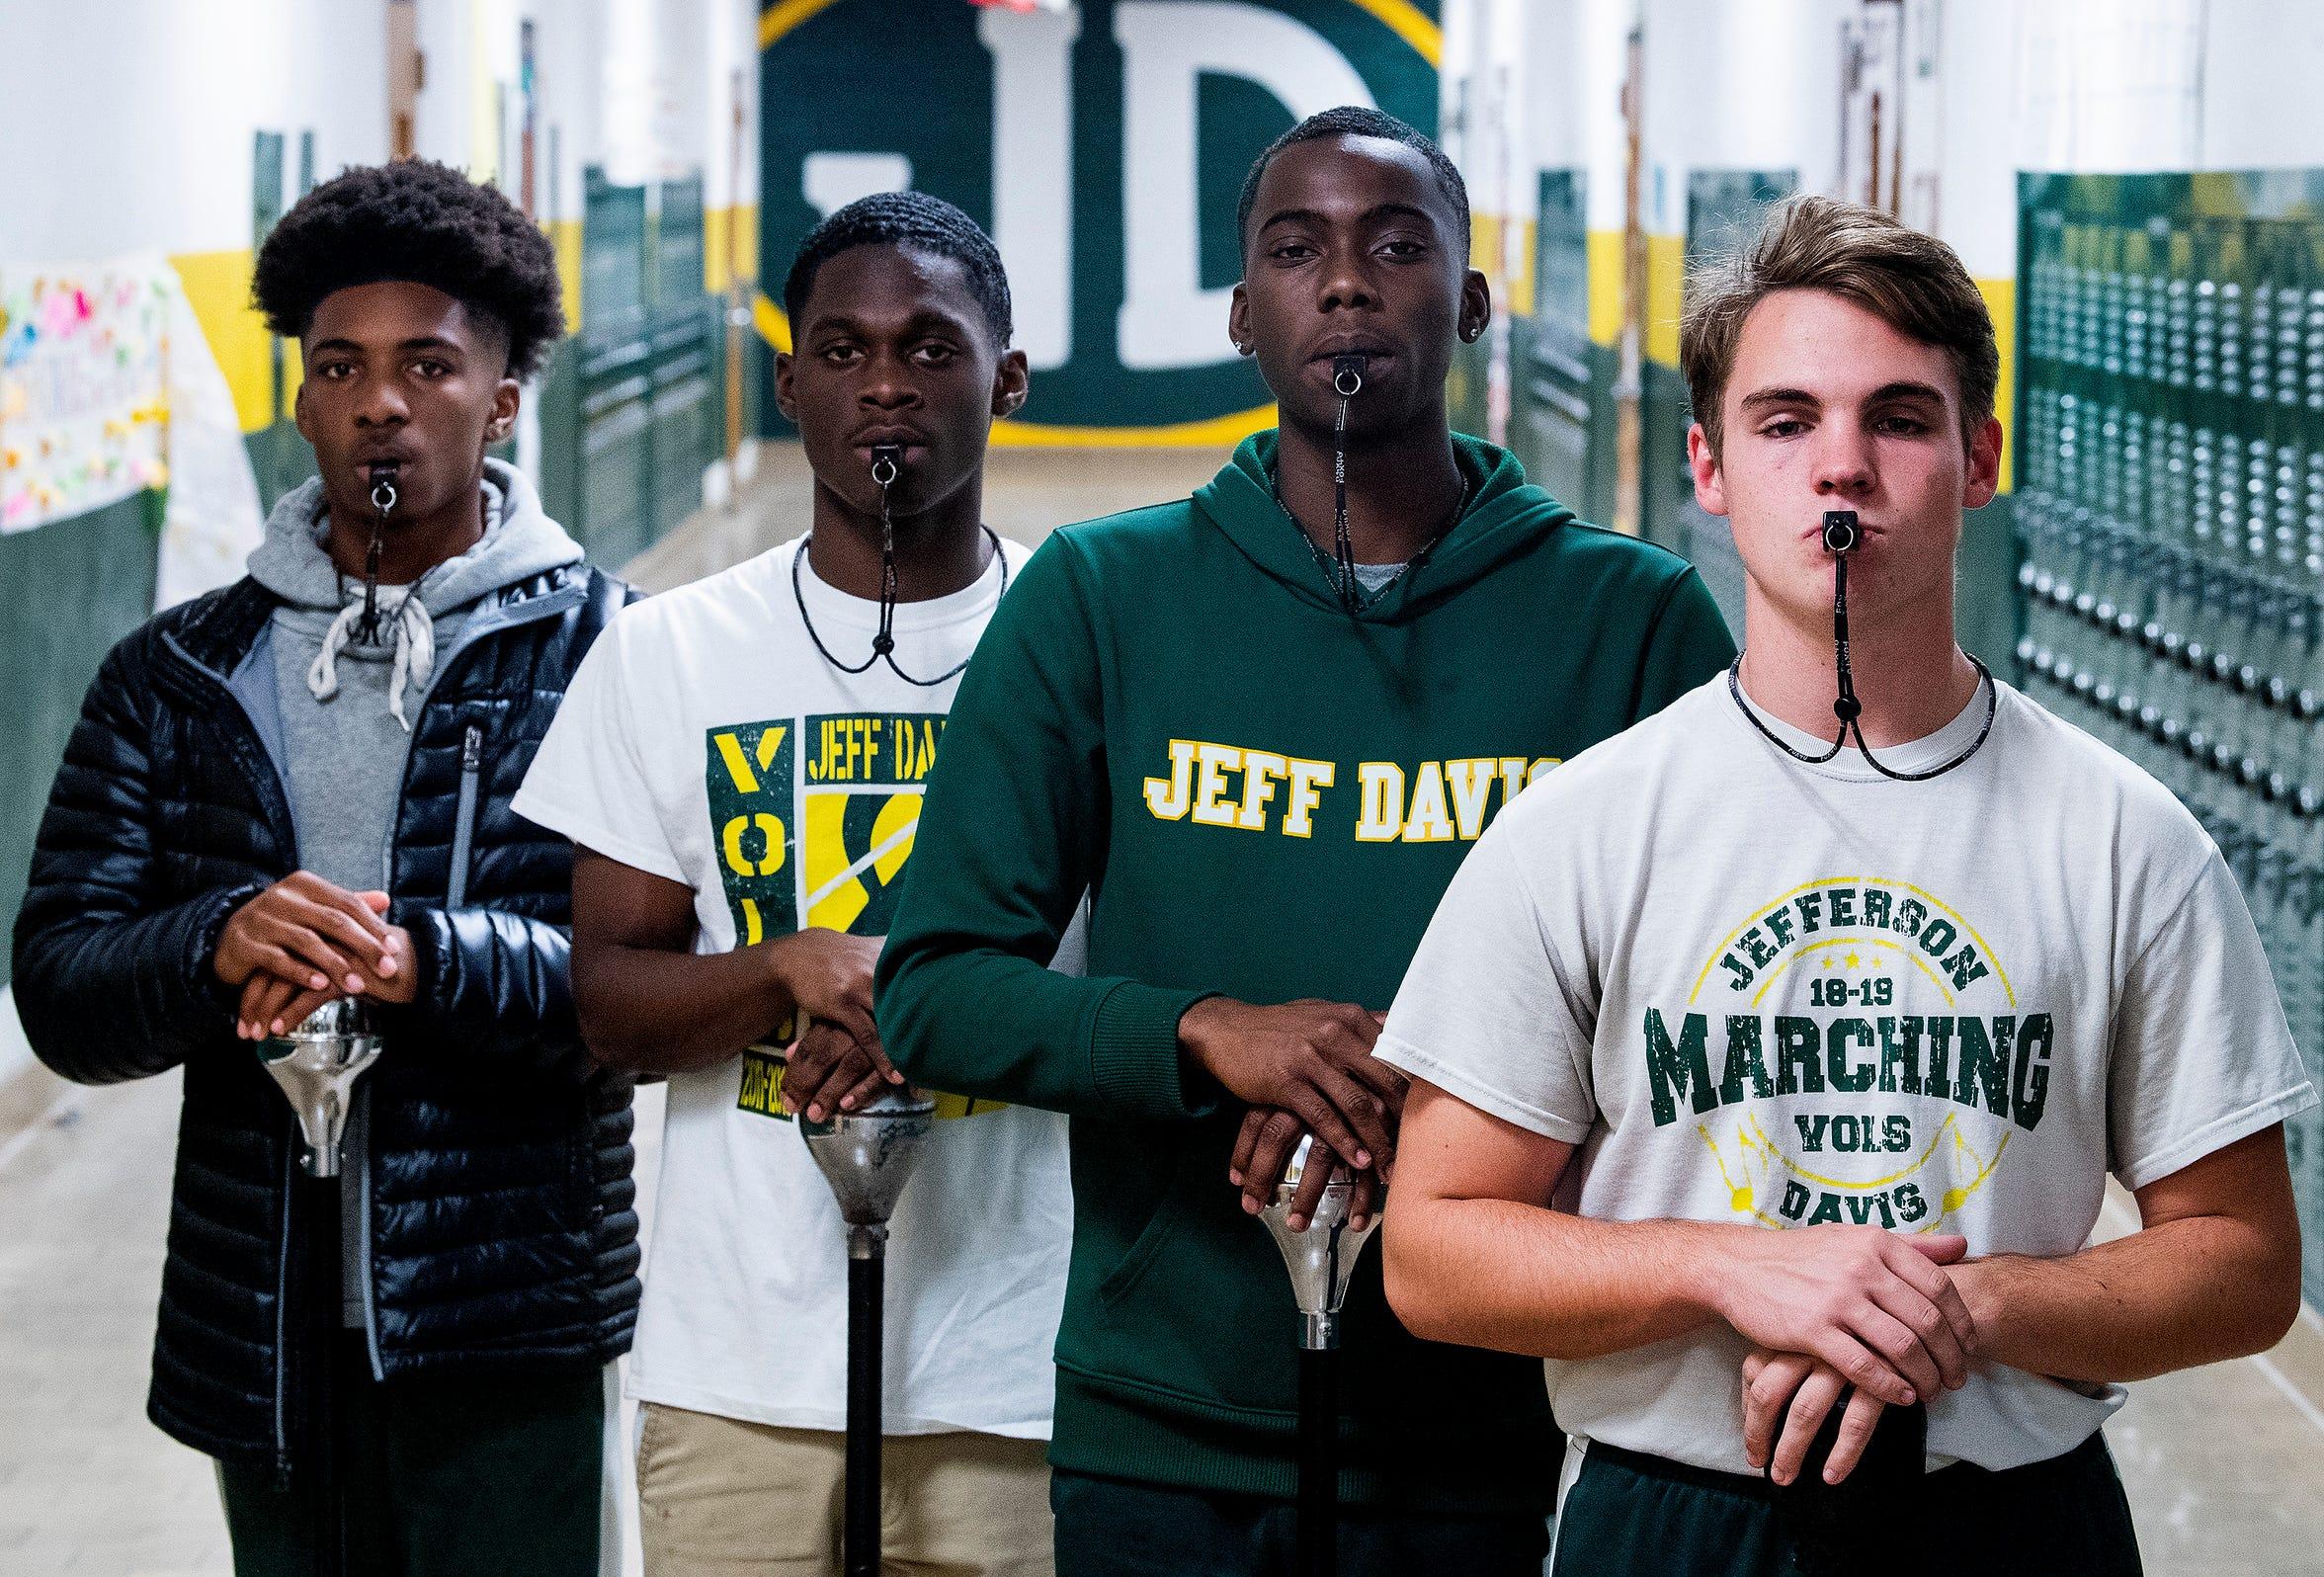 Jeff Davis Marching Band Drum Majors, from left, Jalen Jones, Dominic Williams, Xavier Jackson and Justin Heideman pose at the school in Montgomery, Ala., on Wednesday December 4, 2019.